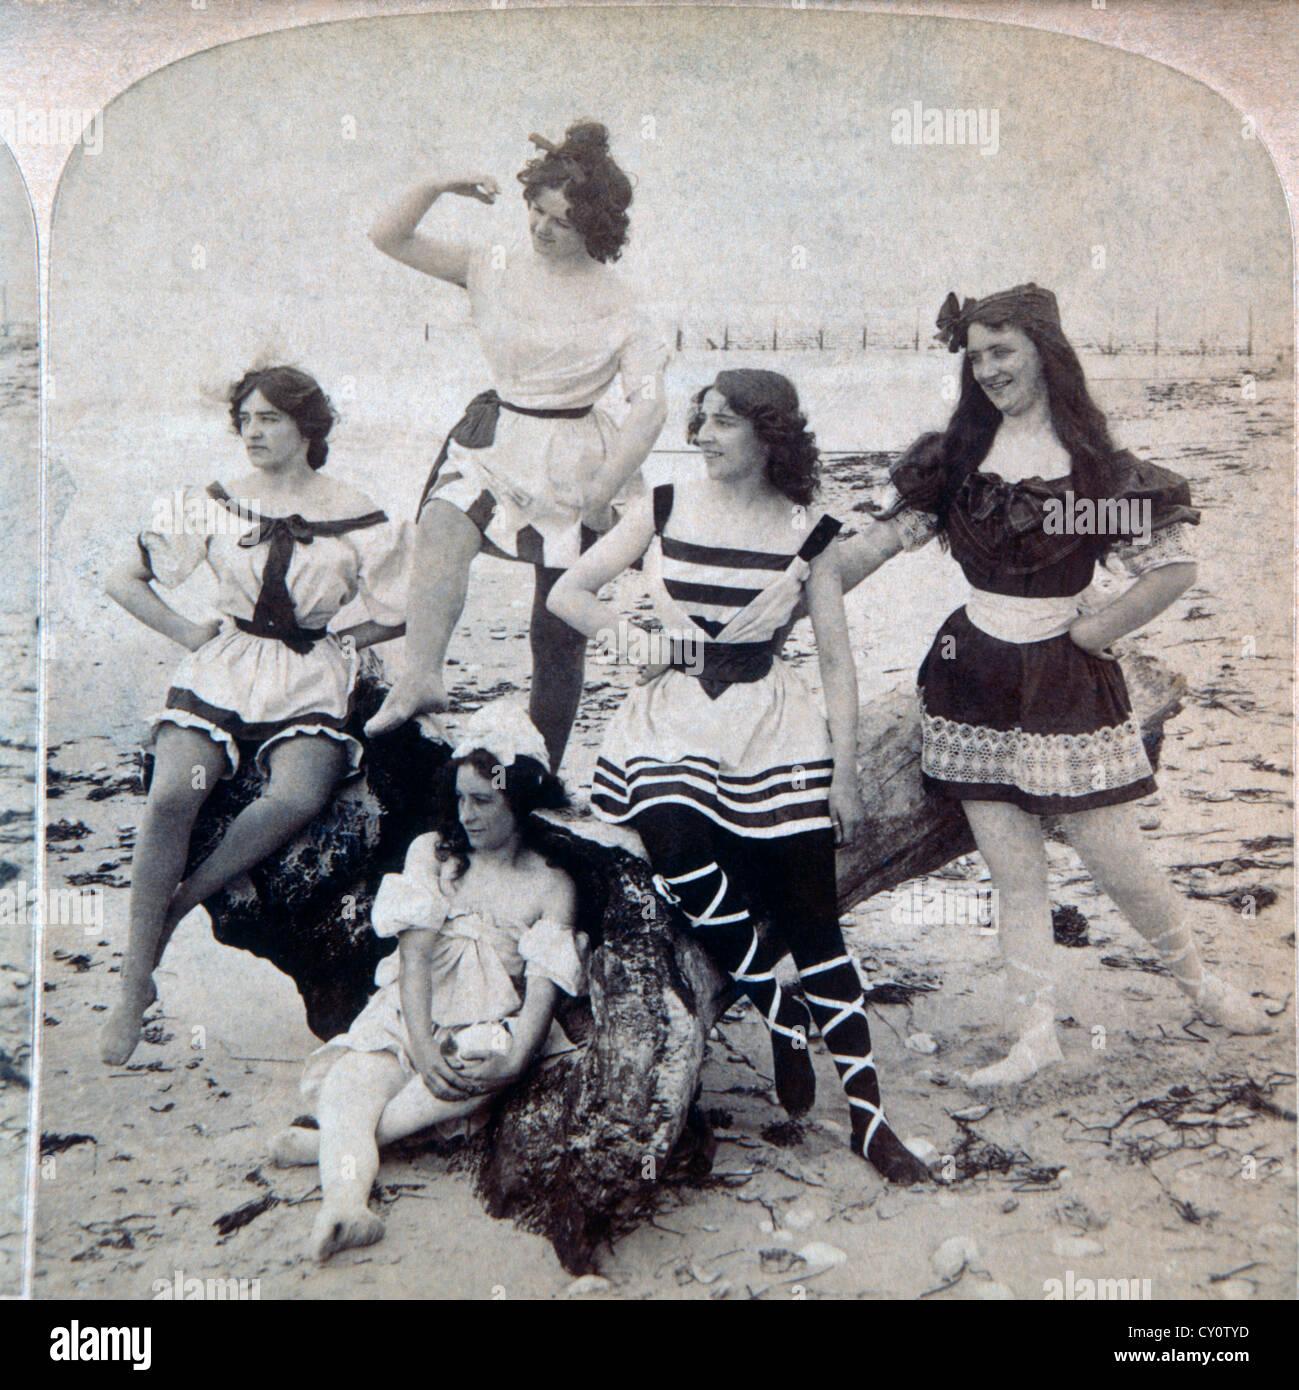 Fünf Frauen am Strand USA, Stereo-Eiweiss zu fotografieren, ca. 1897 Stockfoto